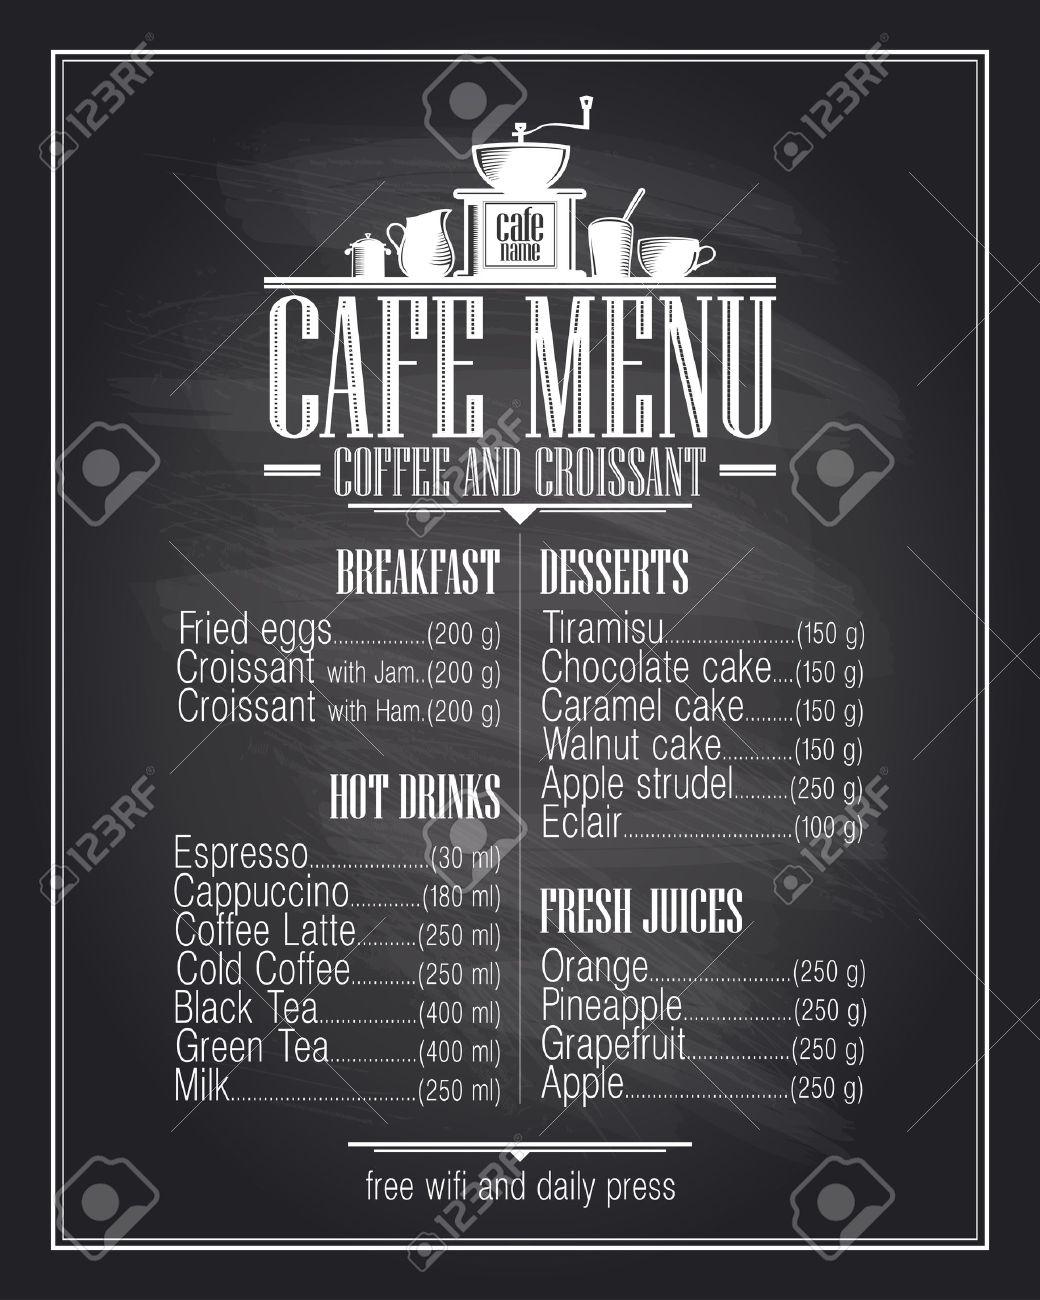 Tafel-Café-Menü-Liste Design Mit Gerichten Namen, Retro-Stil ...